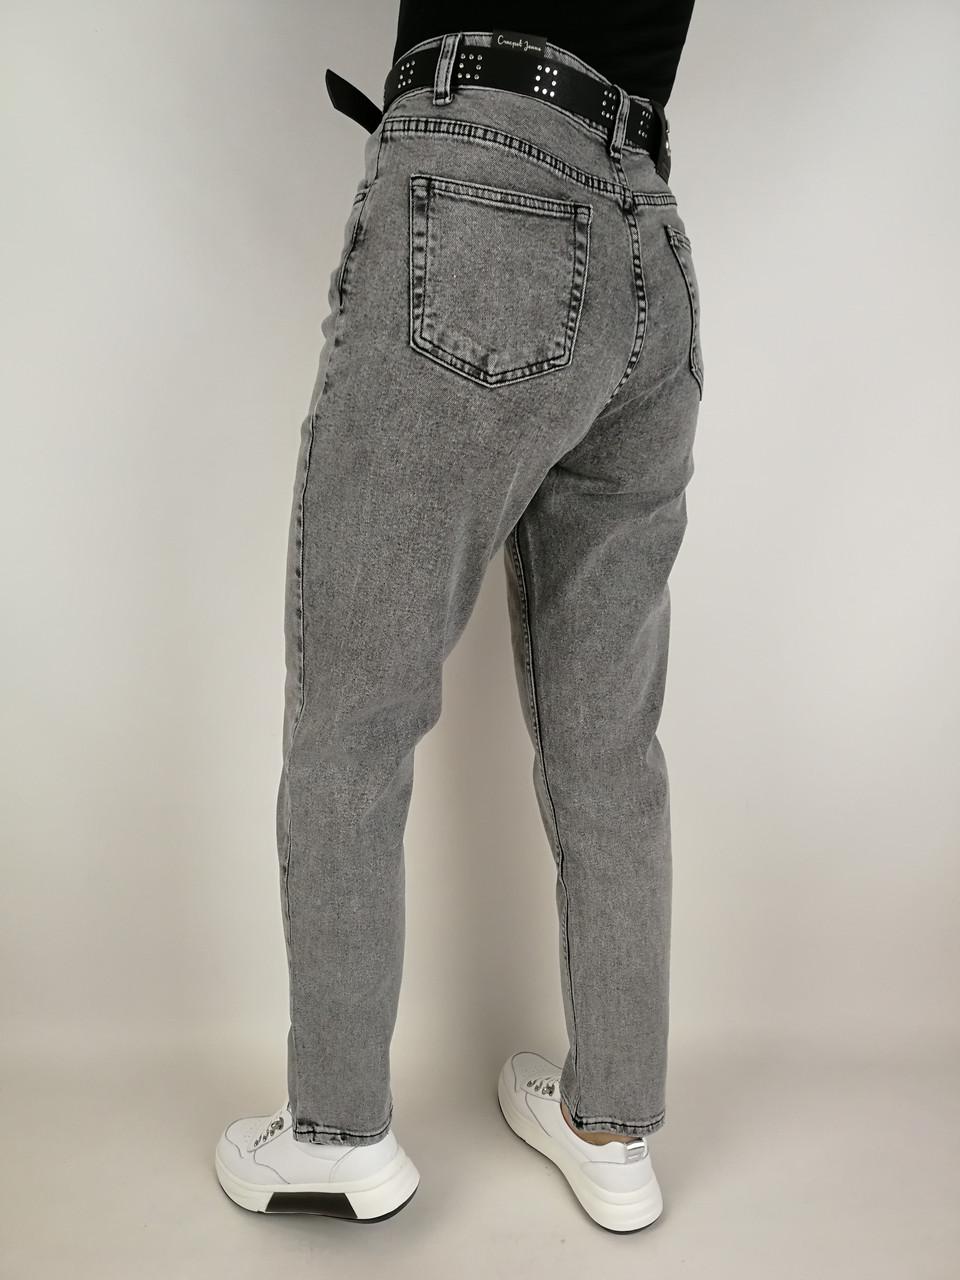 Женские джинсы мом полубатал